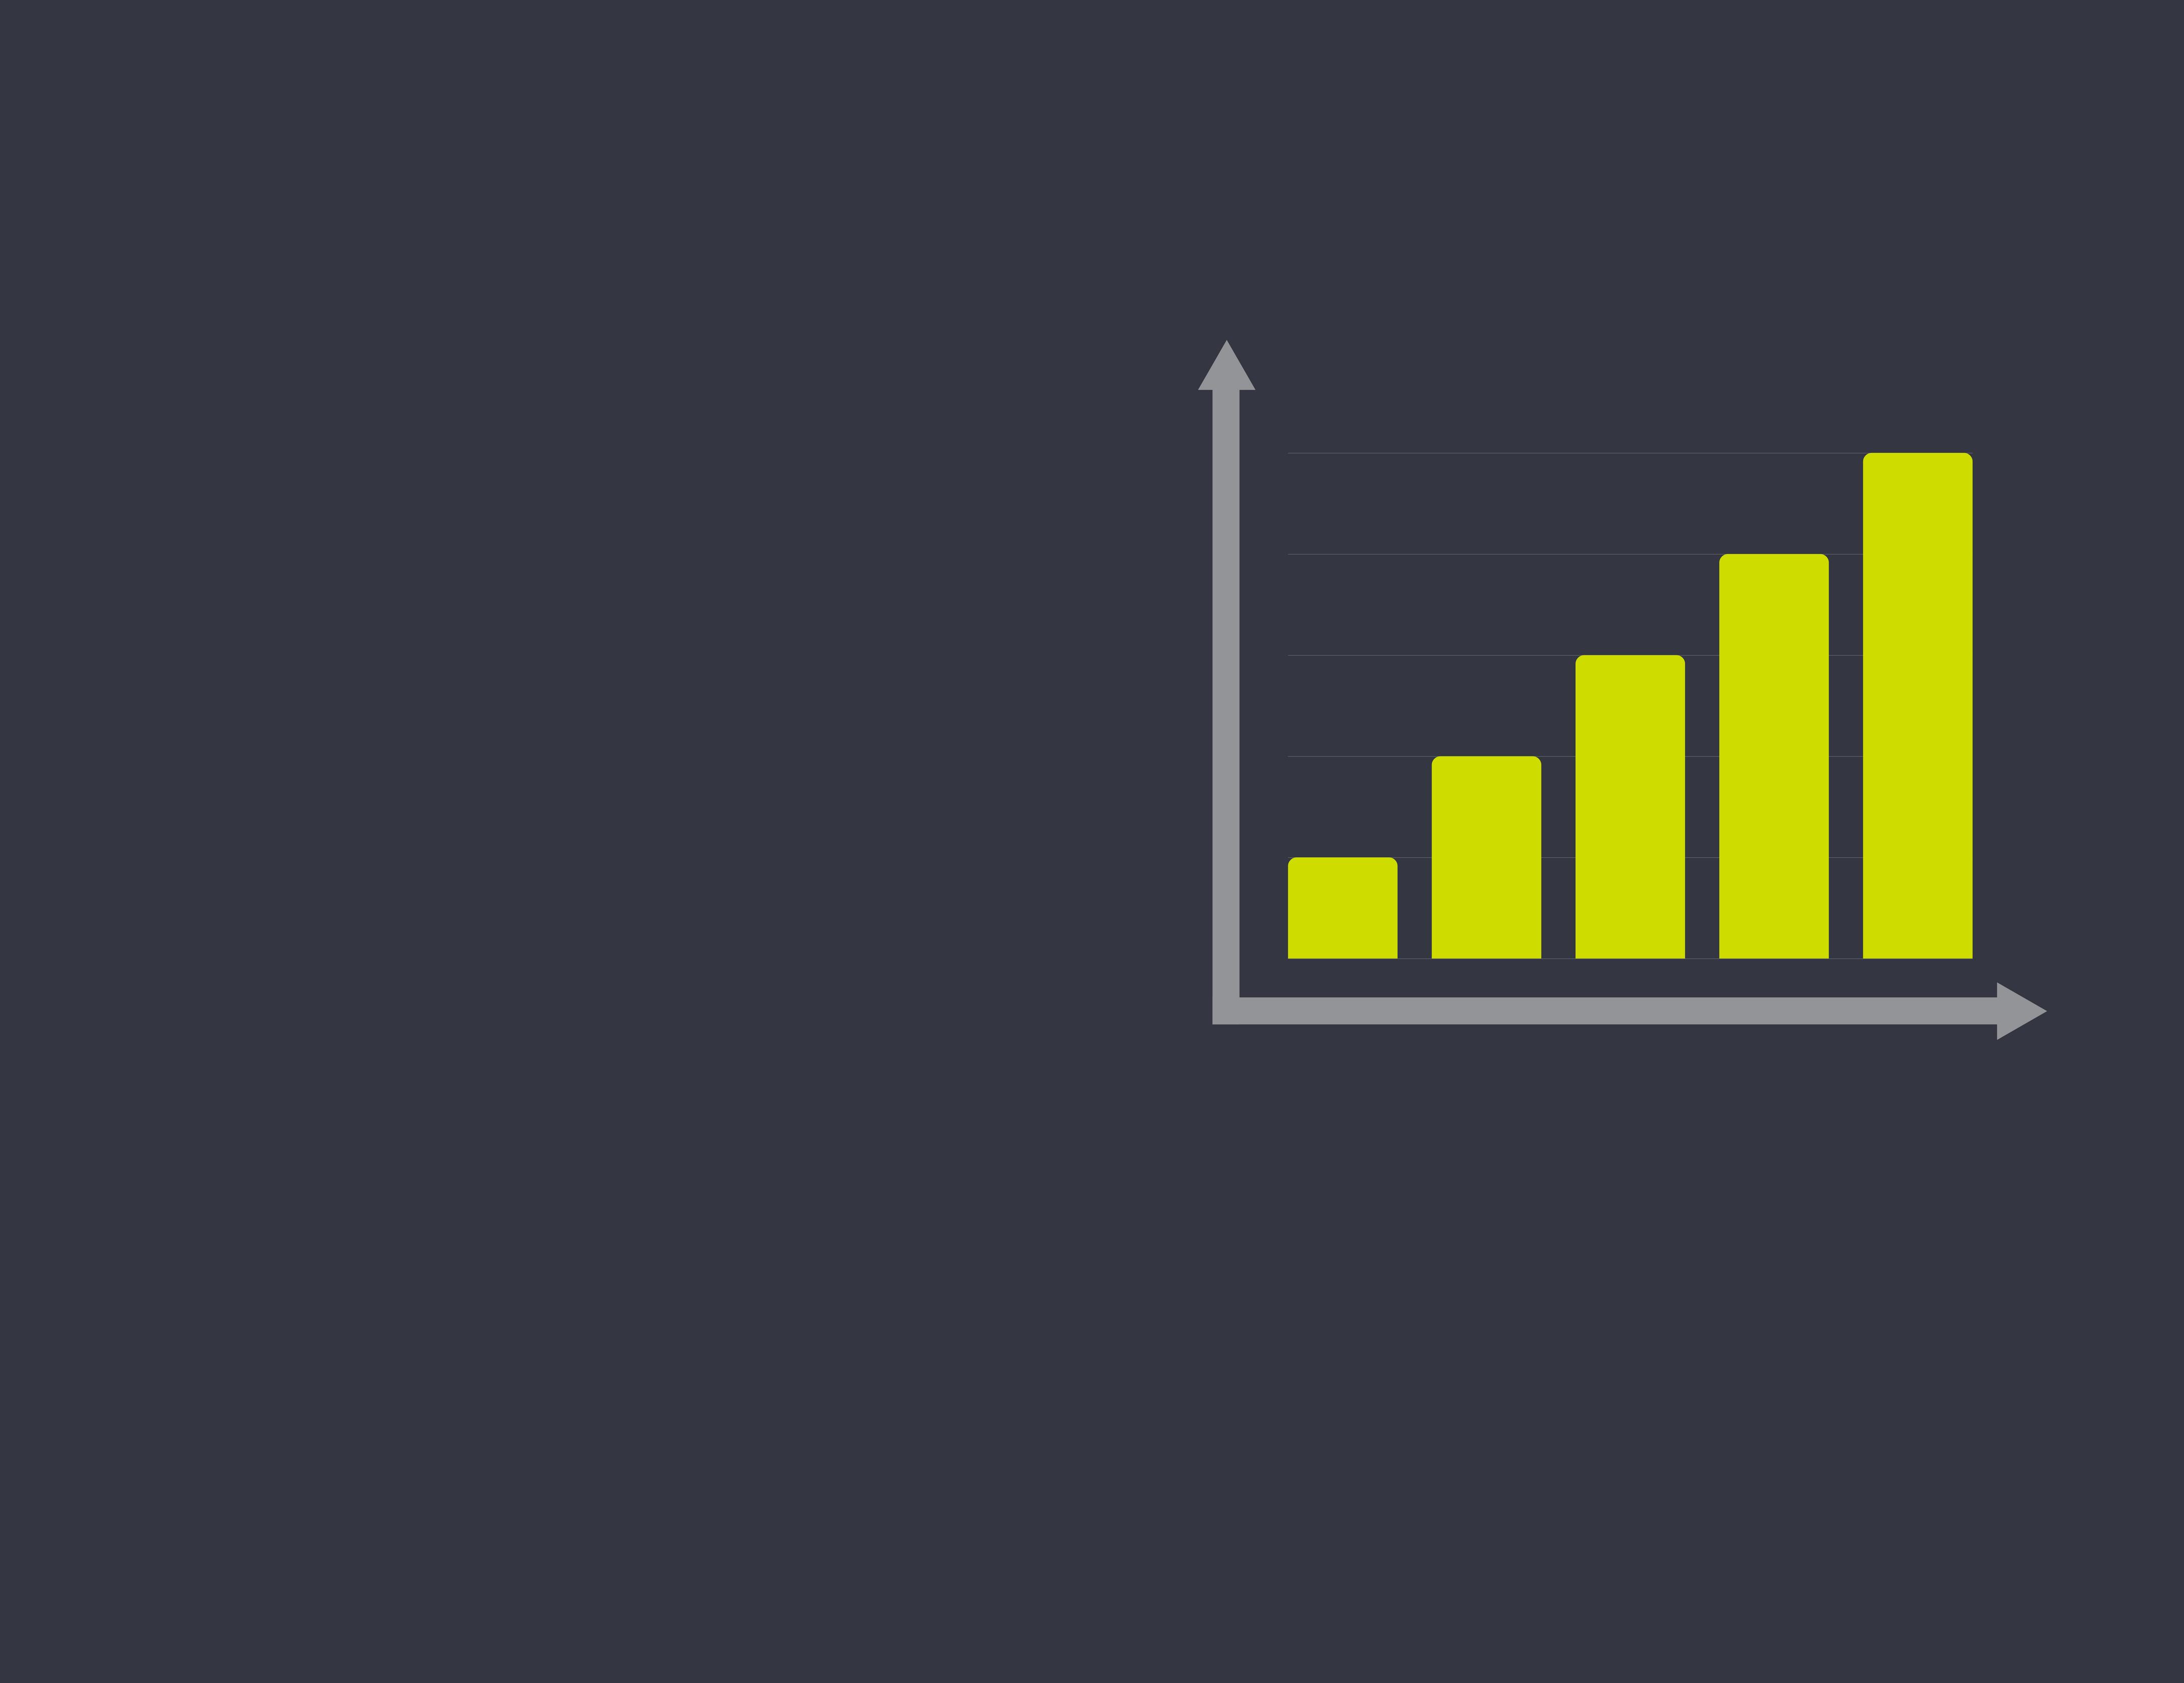 google analytics and social media metrics graph randi digital